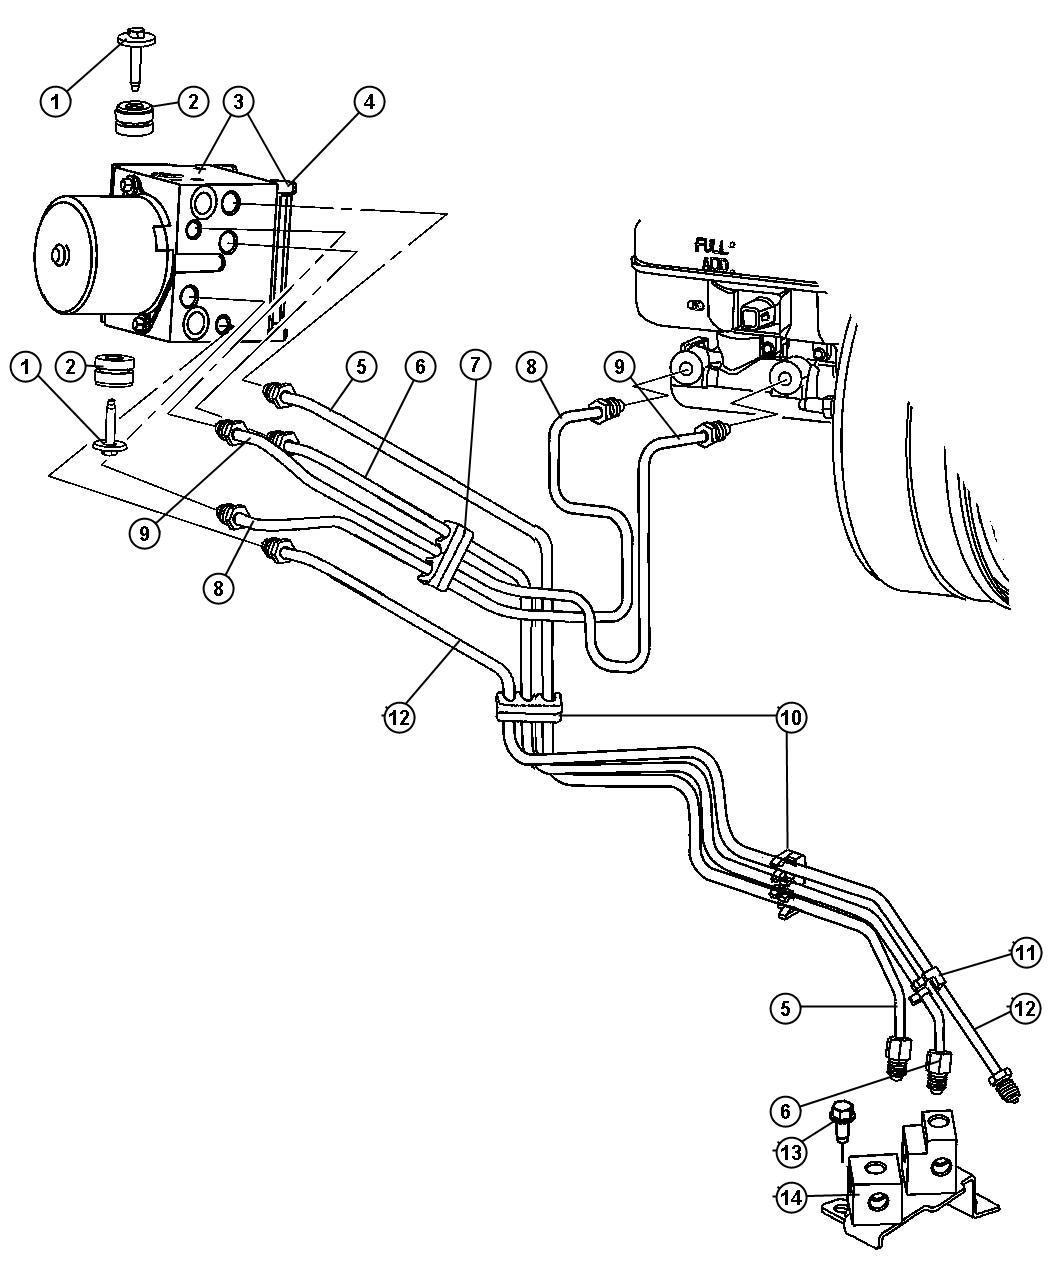 Dodge Factory Brake Lines : Dodge dakota lines brake from ehcu bgk to frame